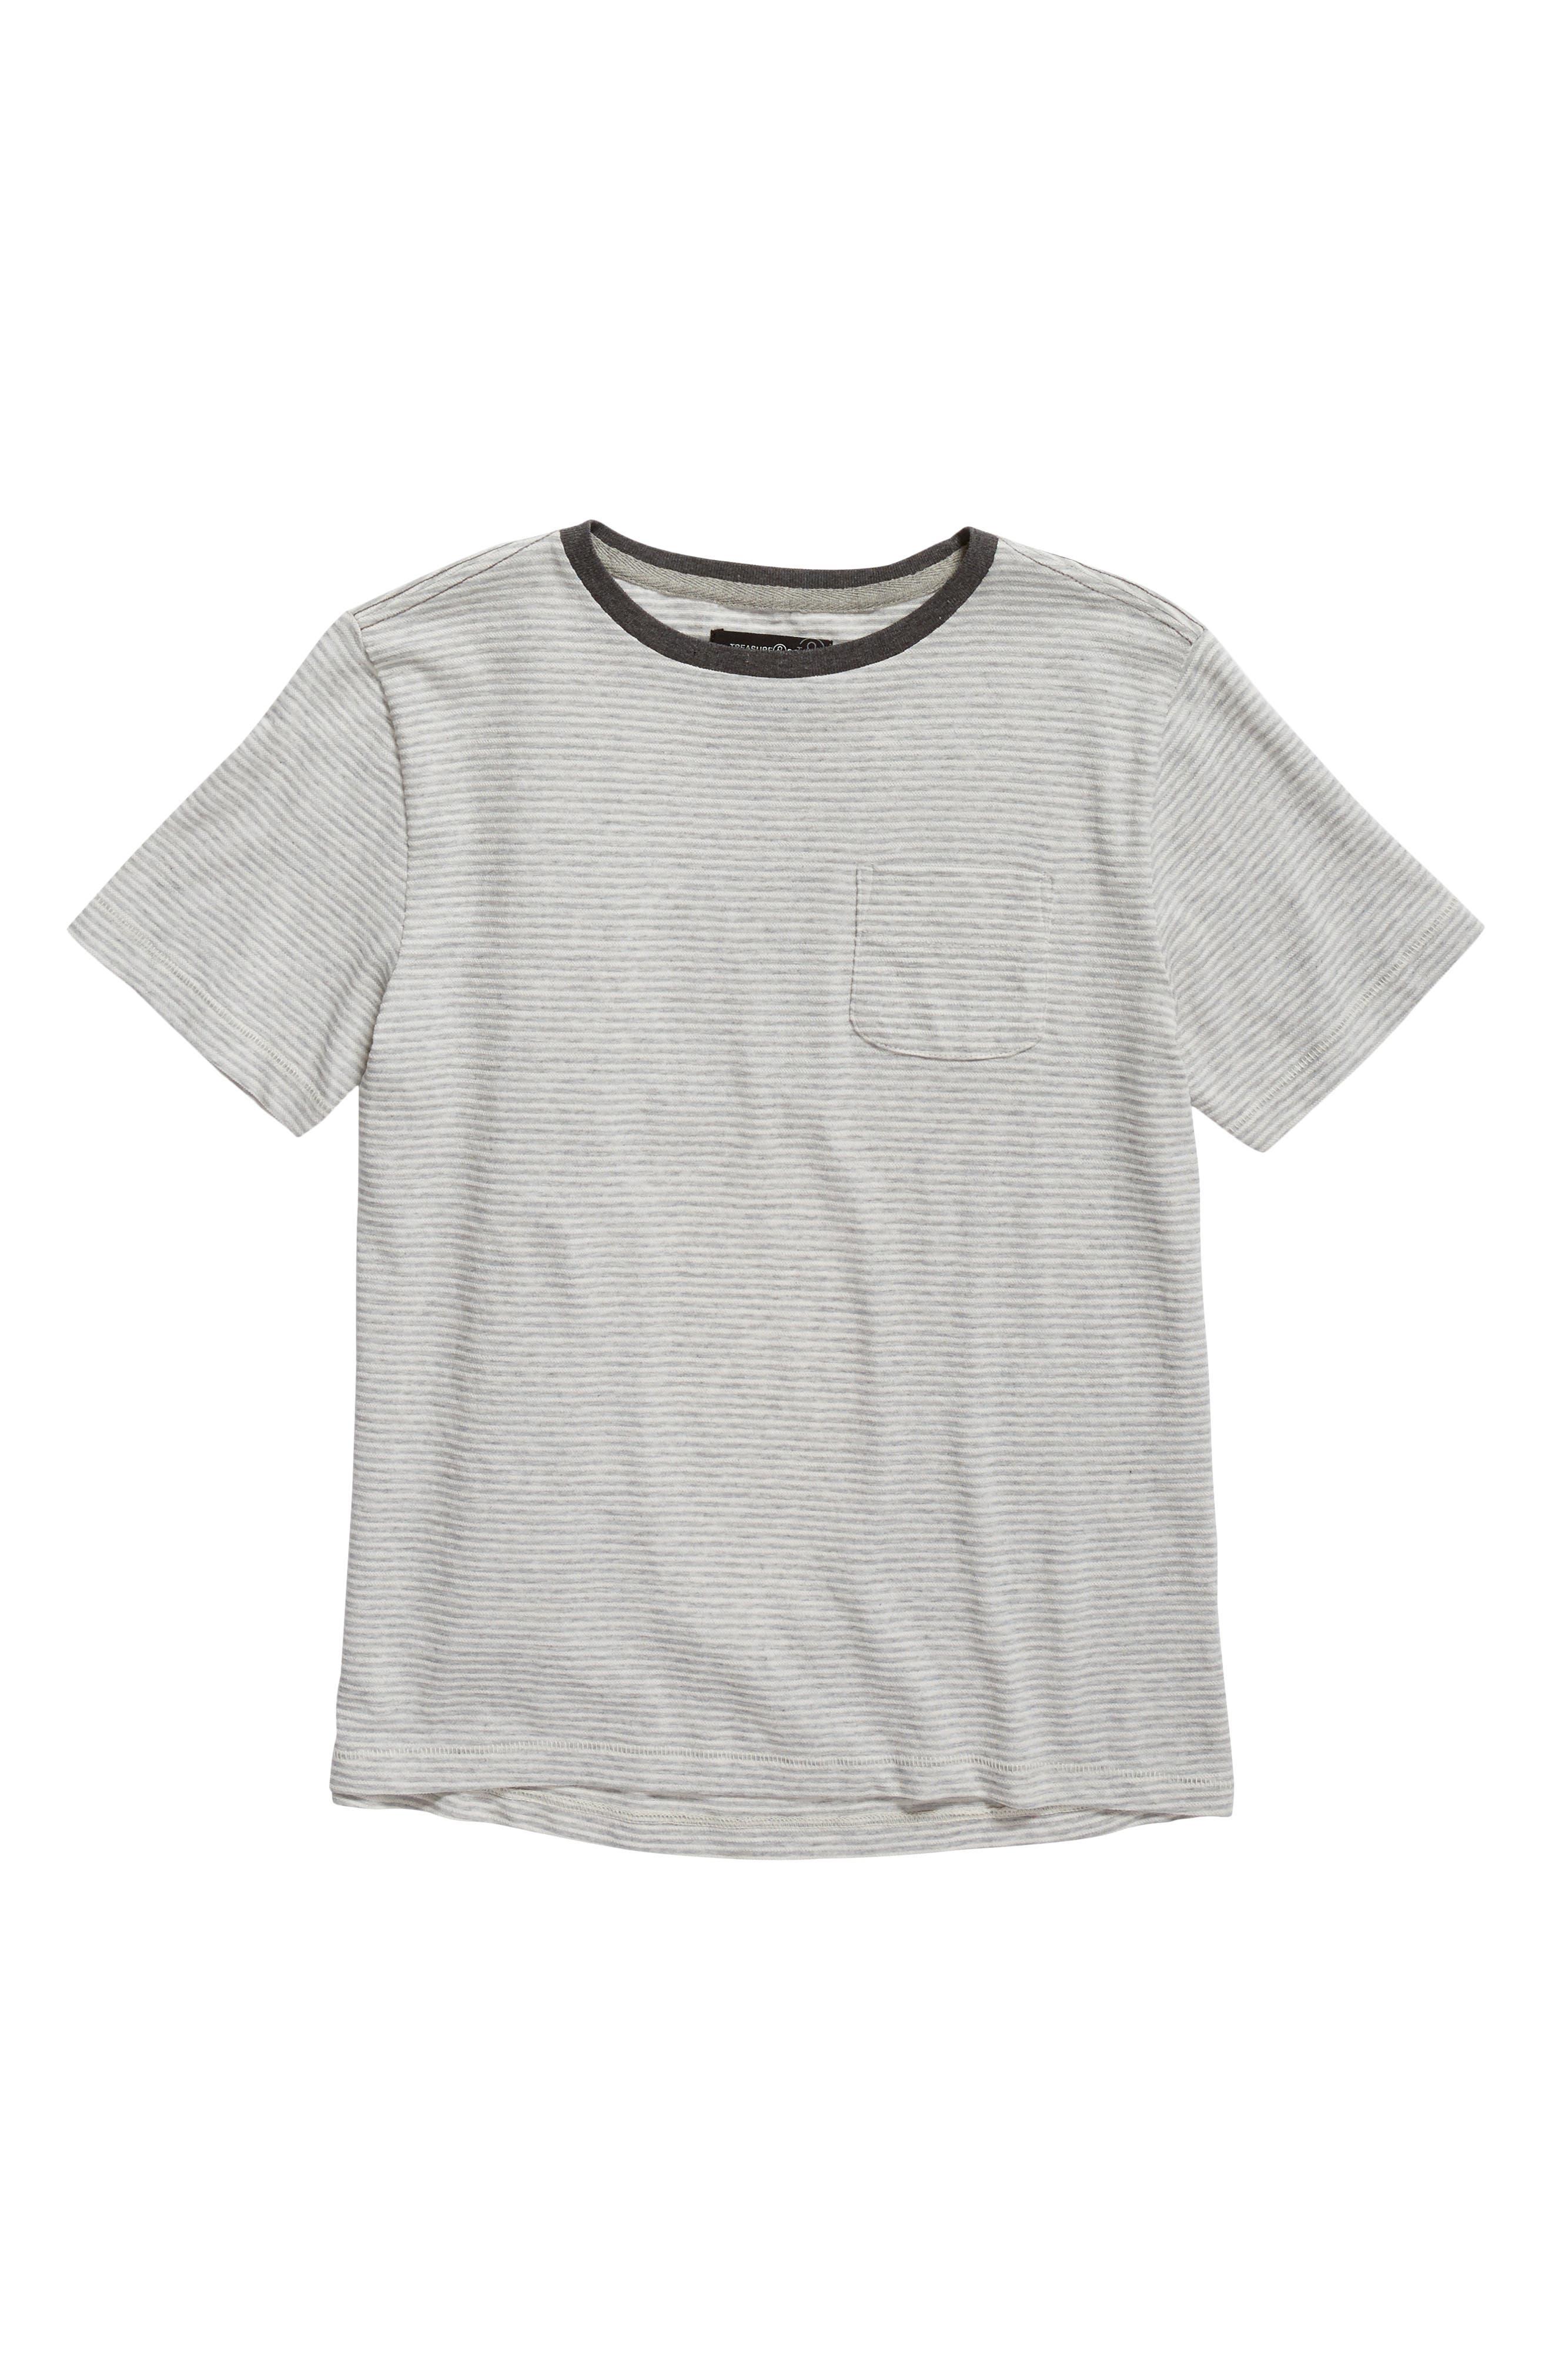 Main Image - Treasure & Bond Stripe Pocket T-Shirt (Big Boys)